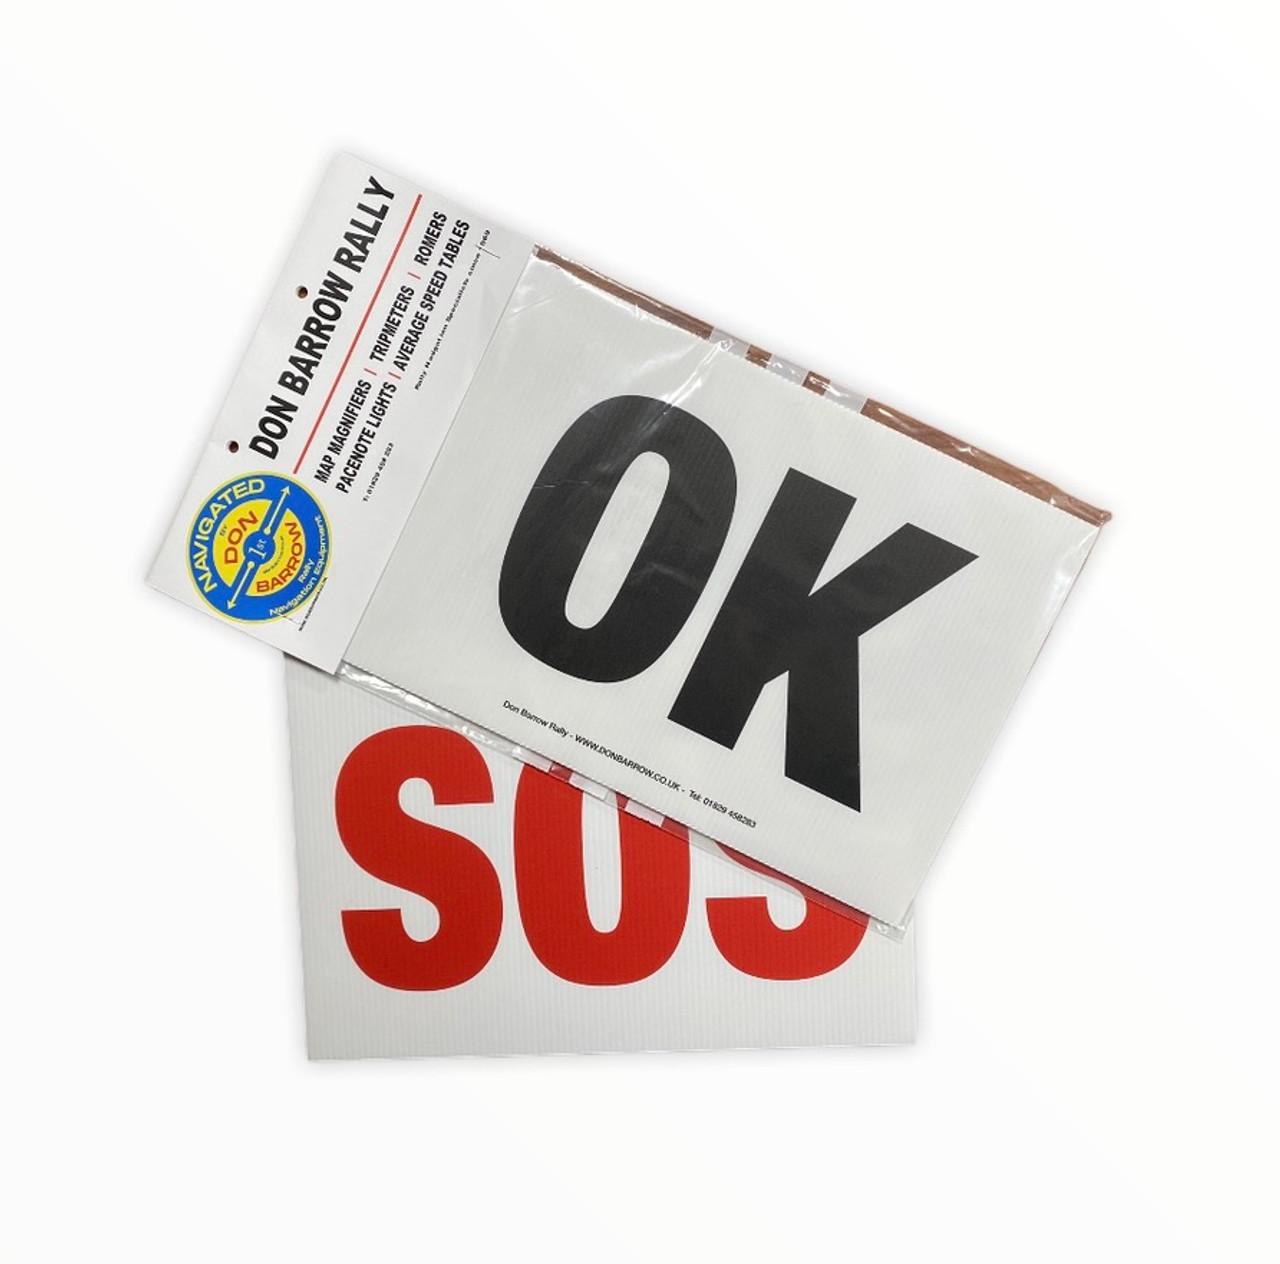 OK-SOS board for Motorsport